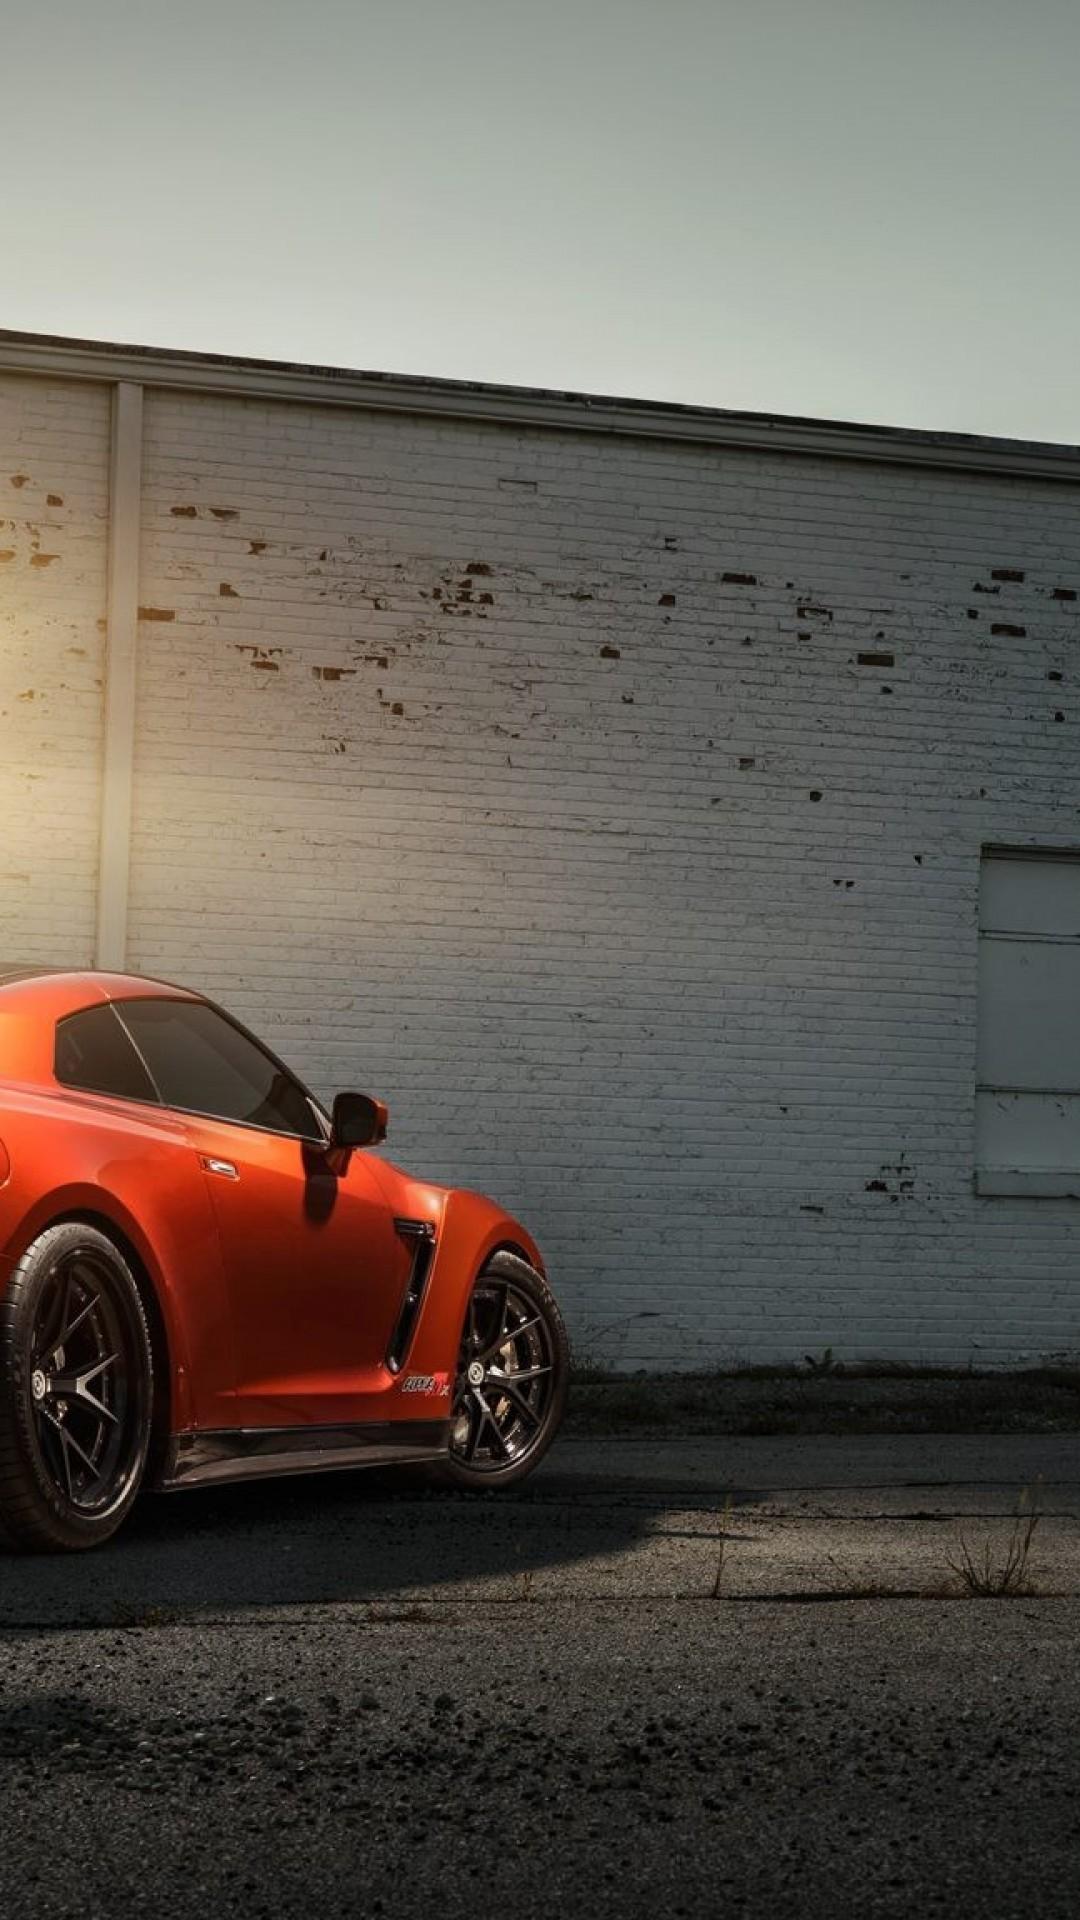 Cars, Nissan Gtr, Sunset